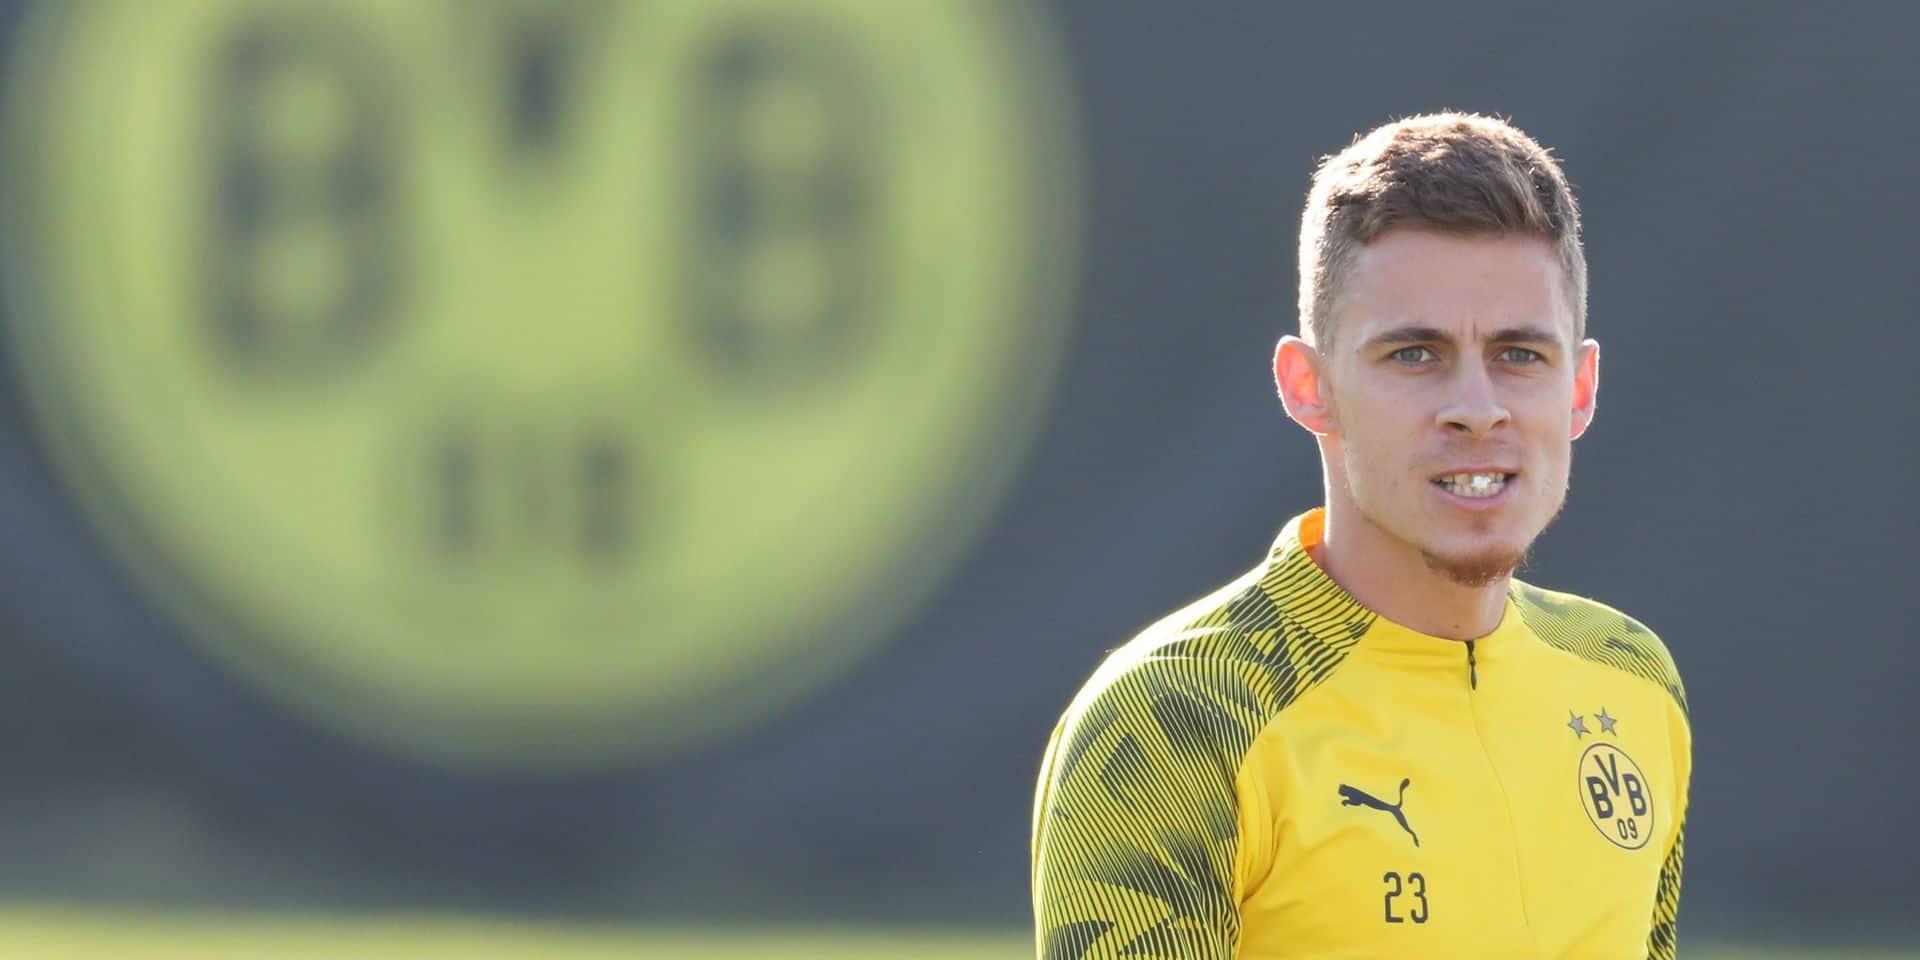 Borussia Dortmund - Training camp in Marbella